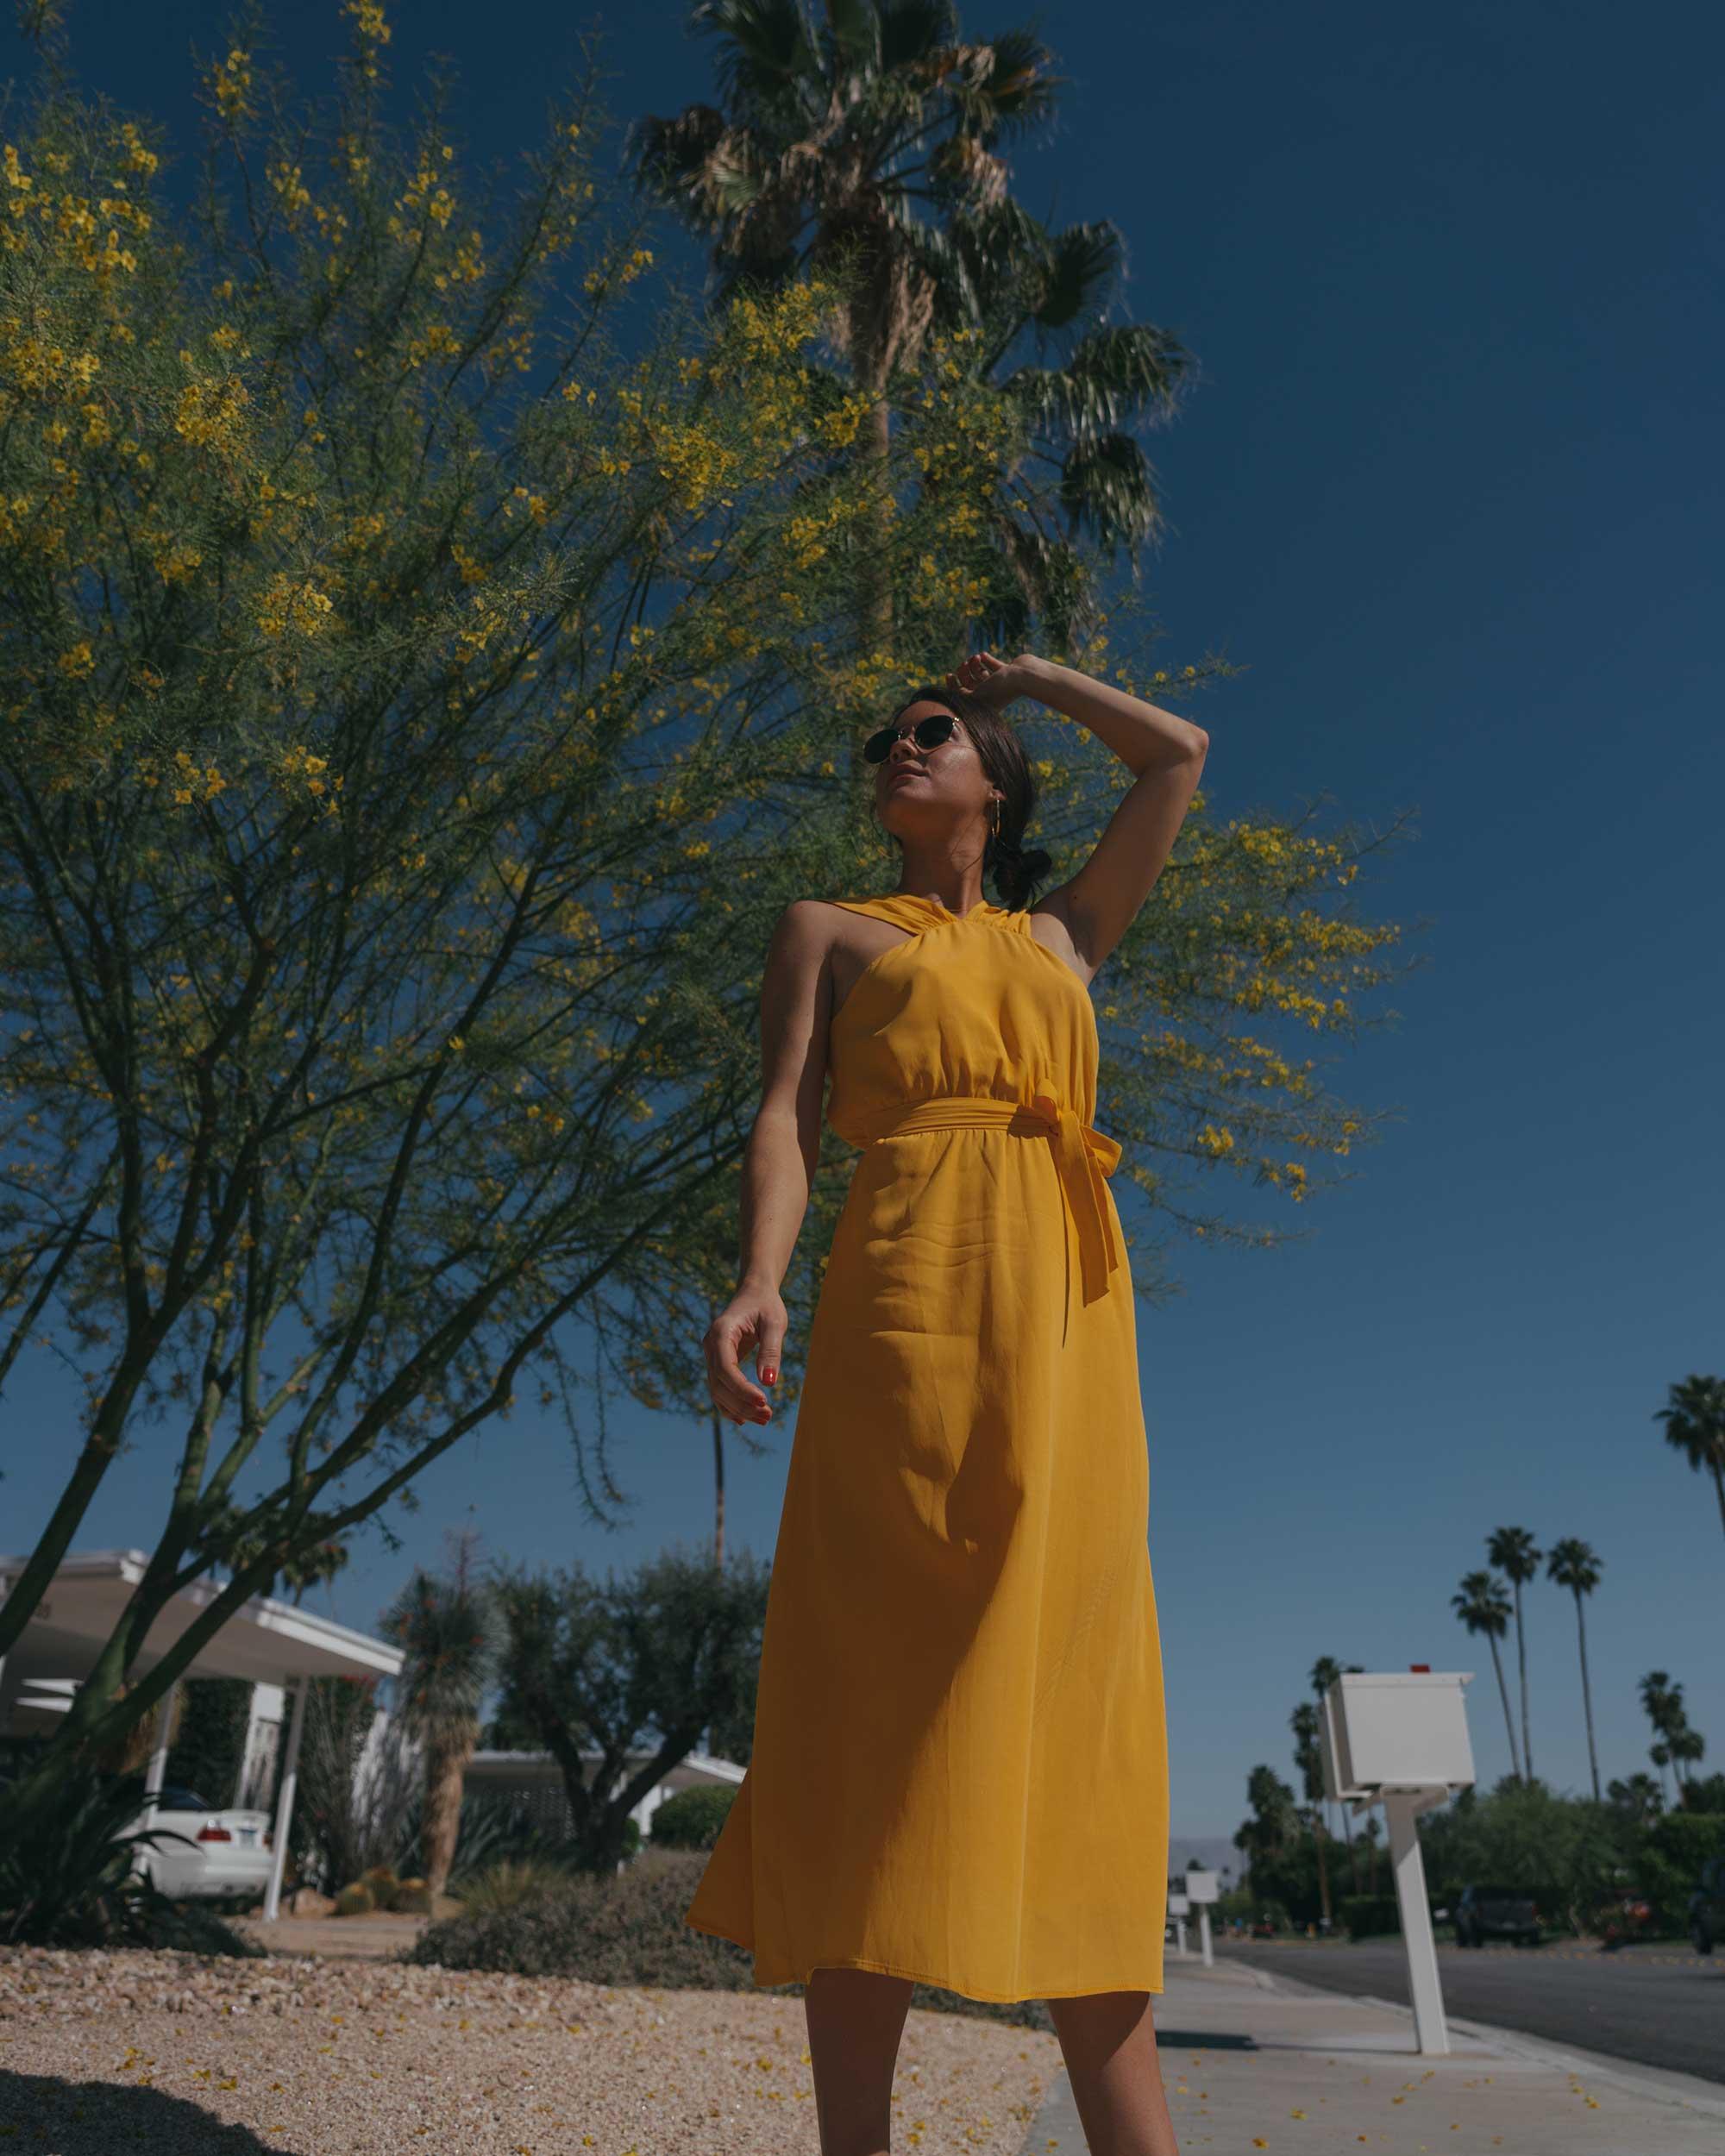 Feminine Yellow Cross Front Midi Dress Palm Springs Outfit6.jpg